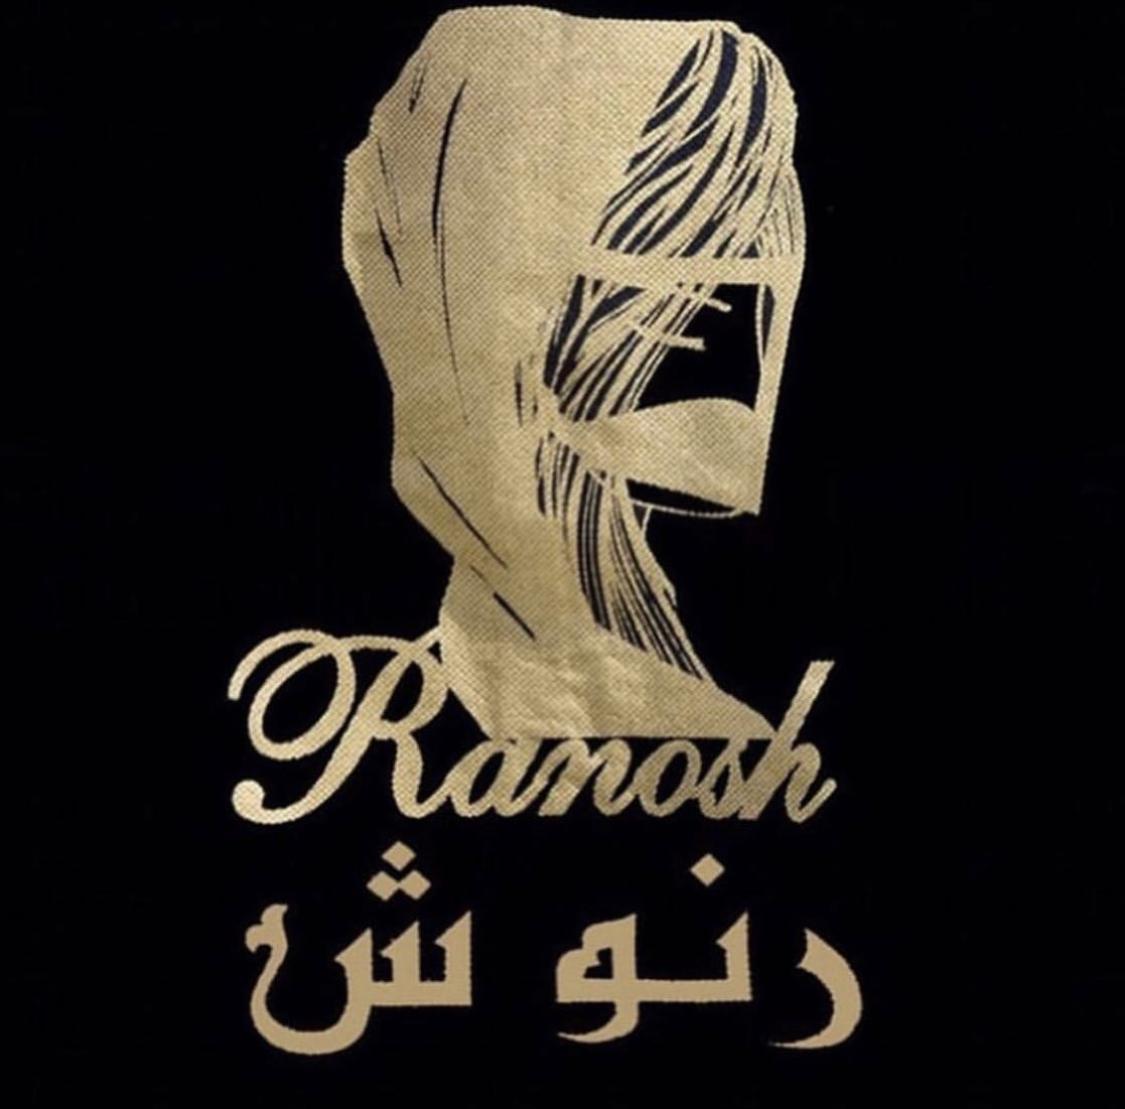 Ranosh